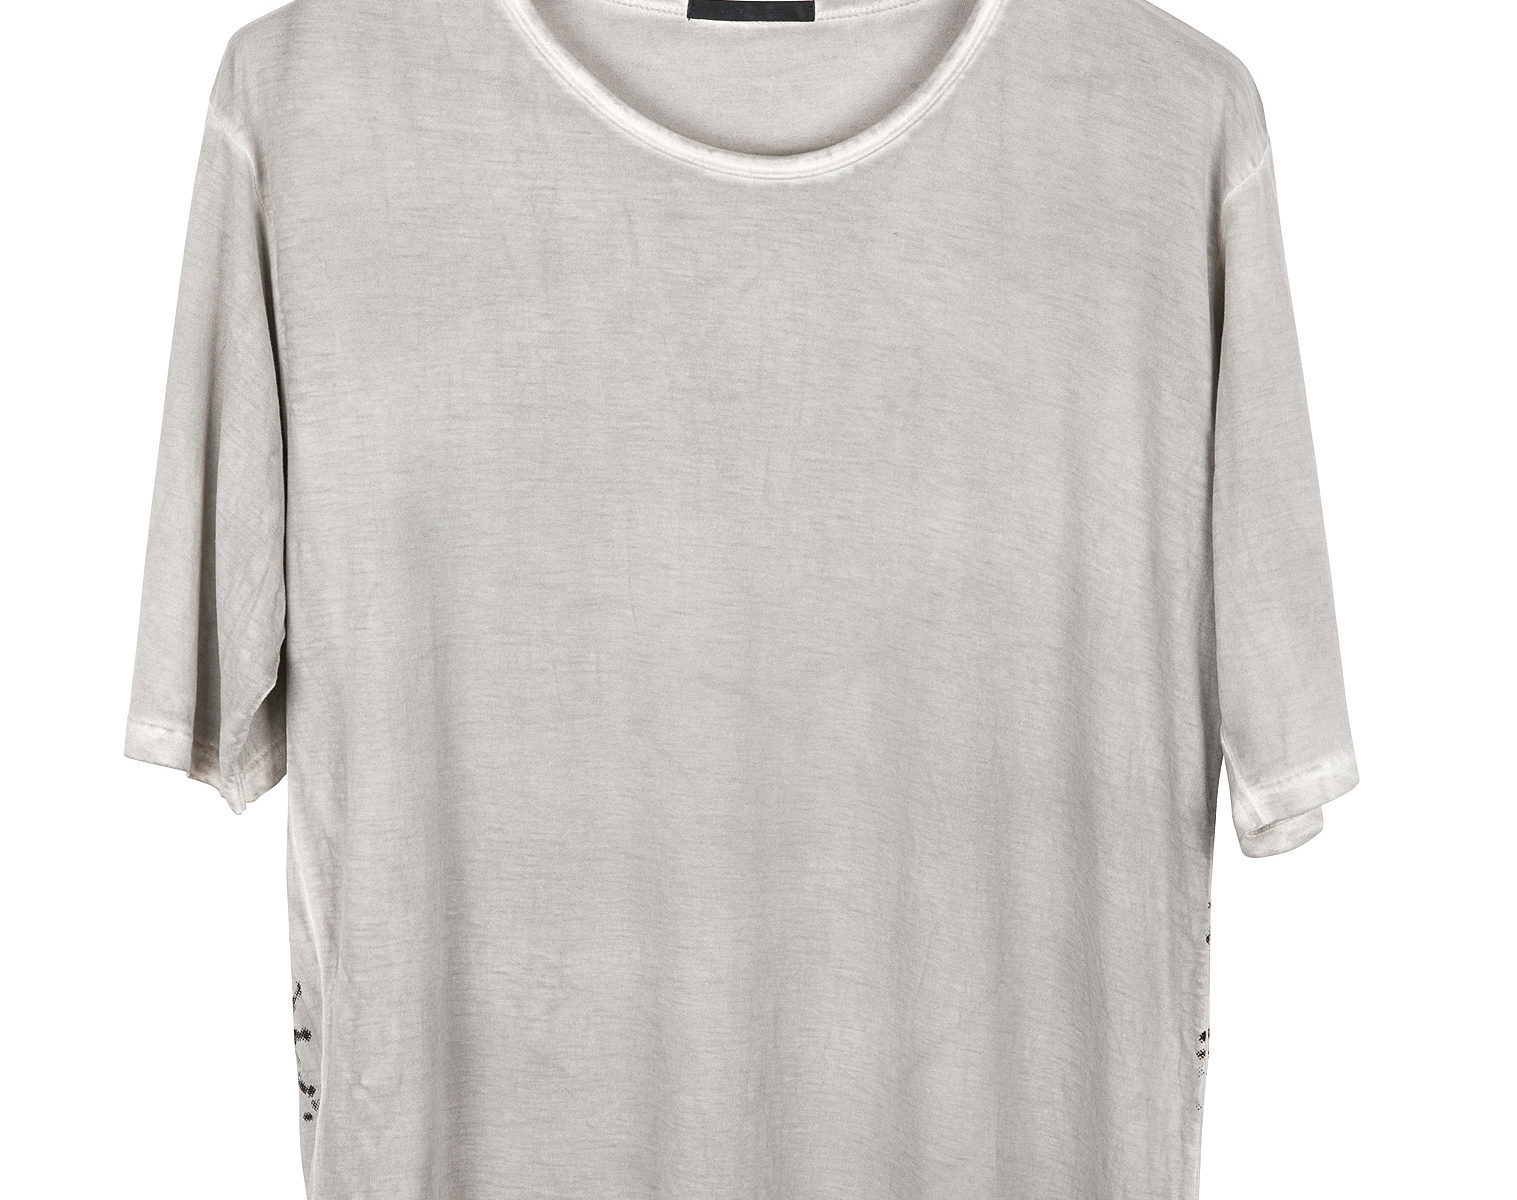 "THE VIRIDI-ANNE ""Correction"" T-Shirt 1"